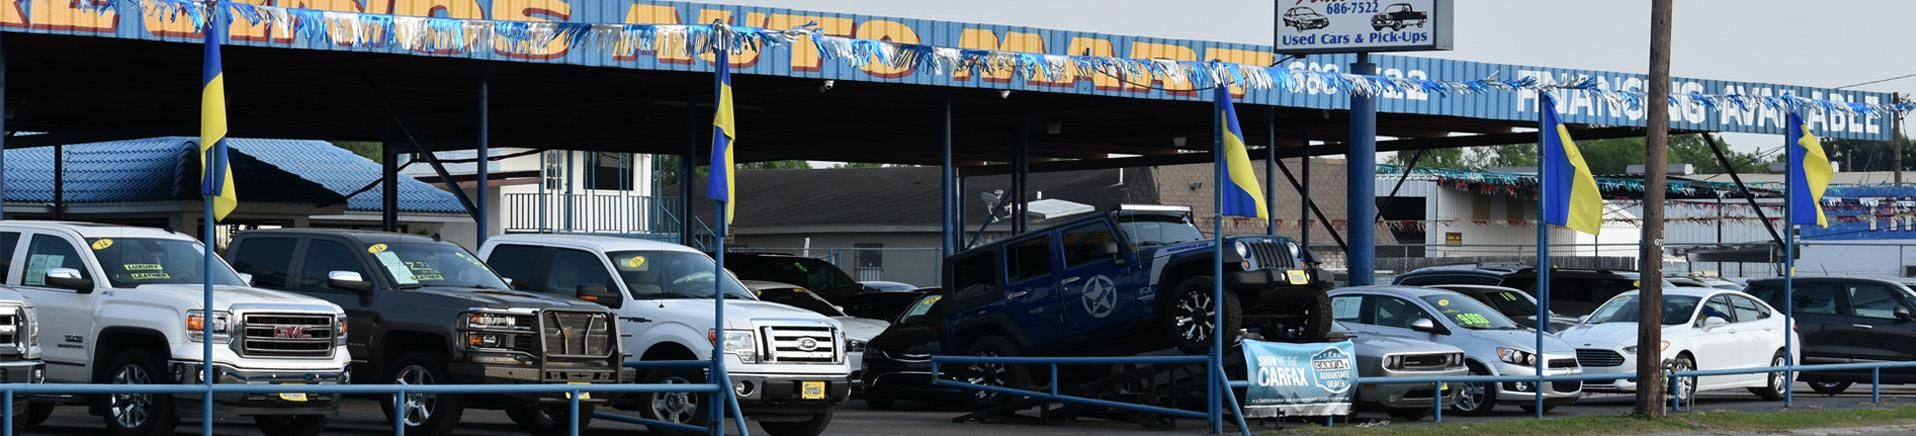 Used Cars McAllen TX   Used Cars & Trucks TX   Trevinos Auto Mart